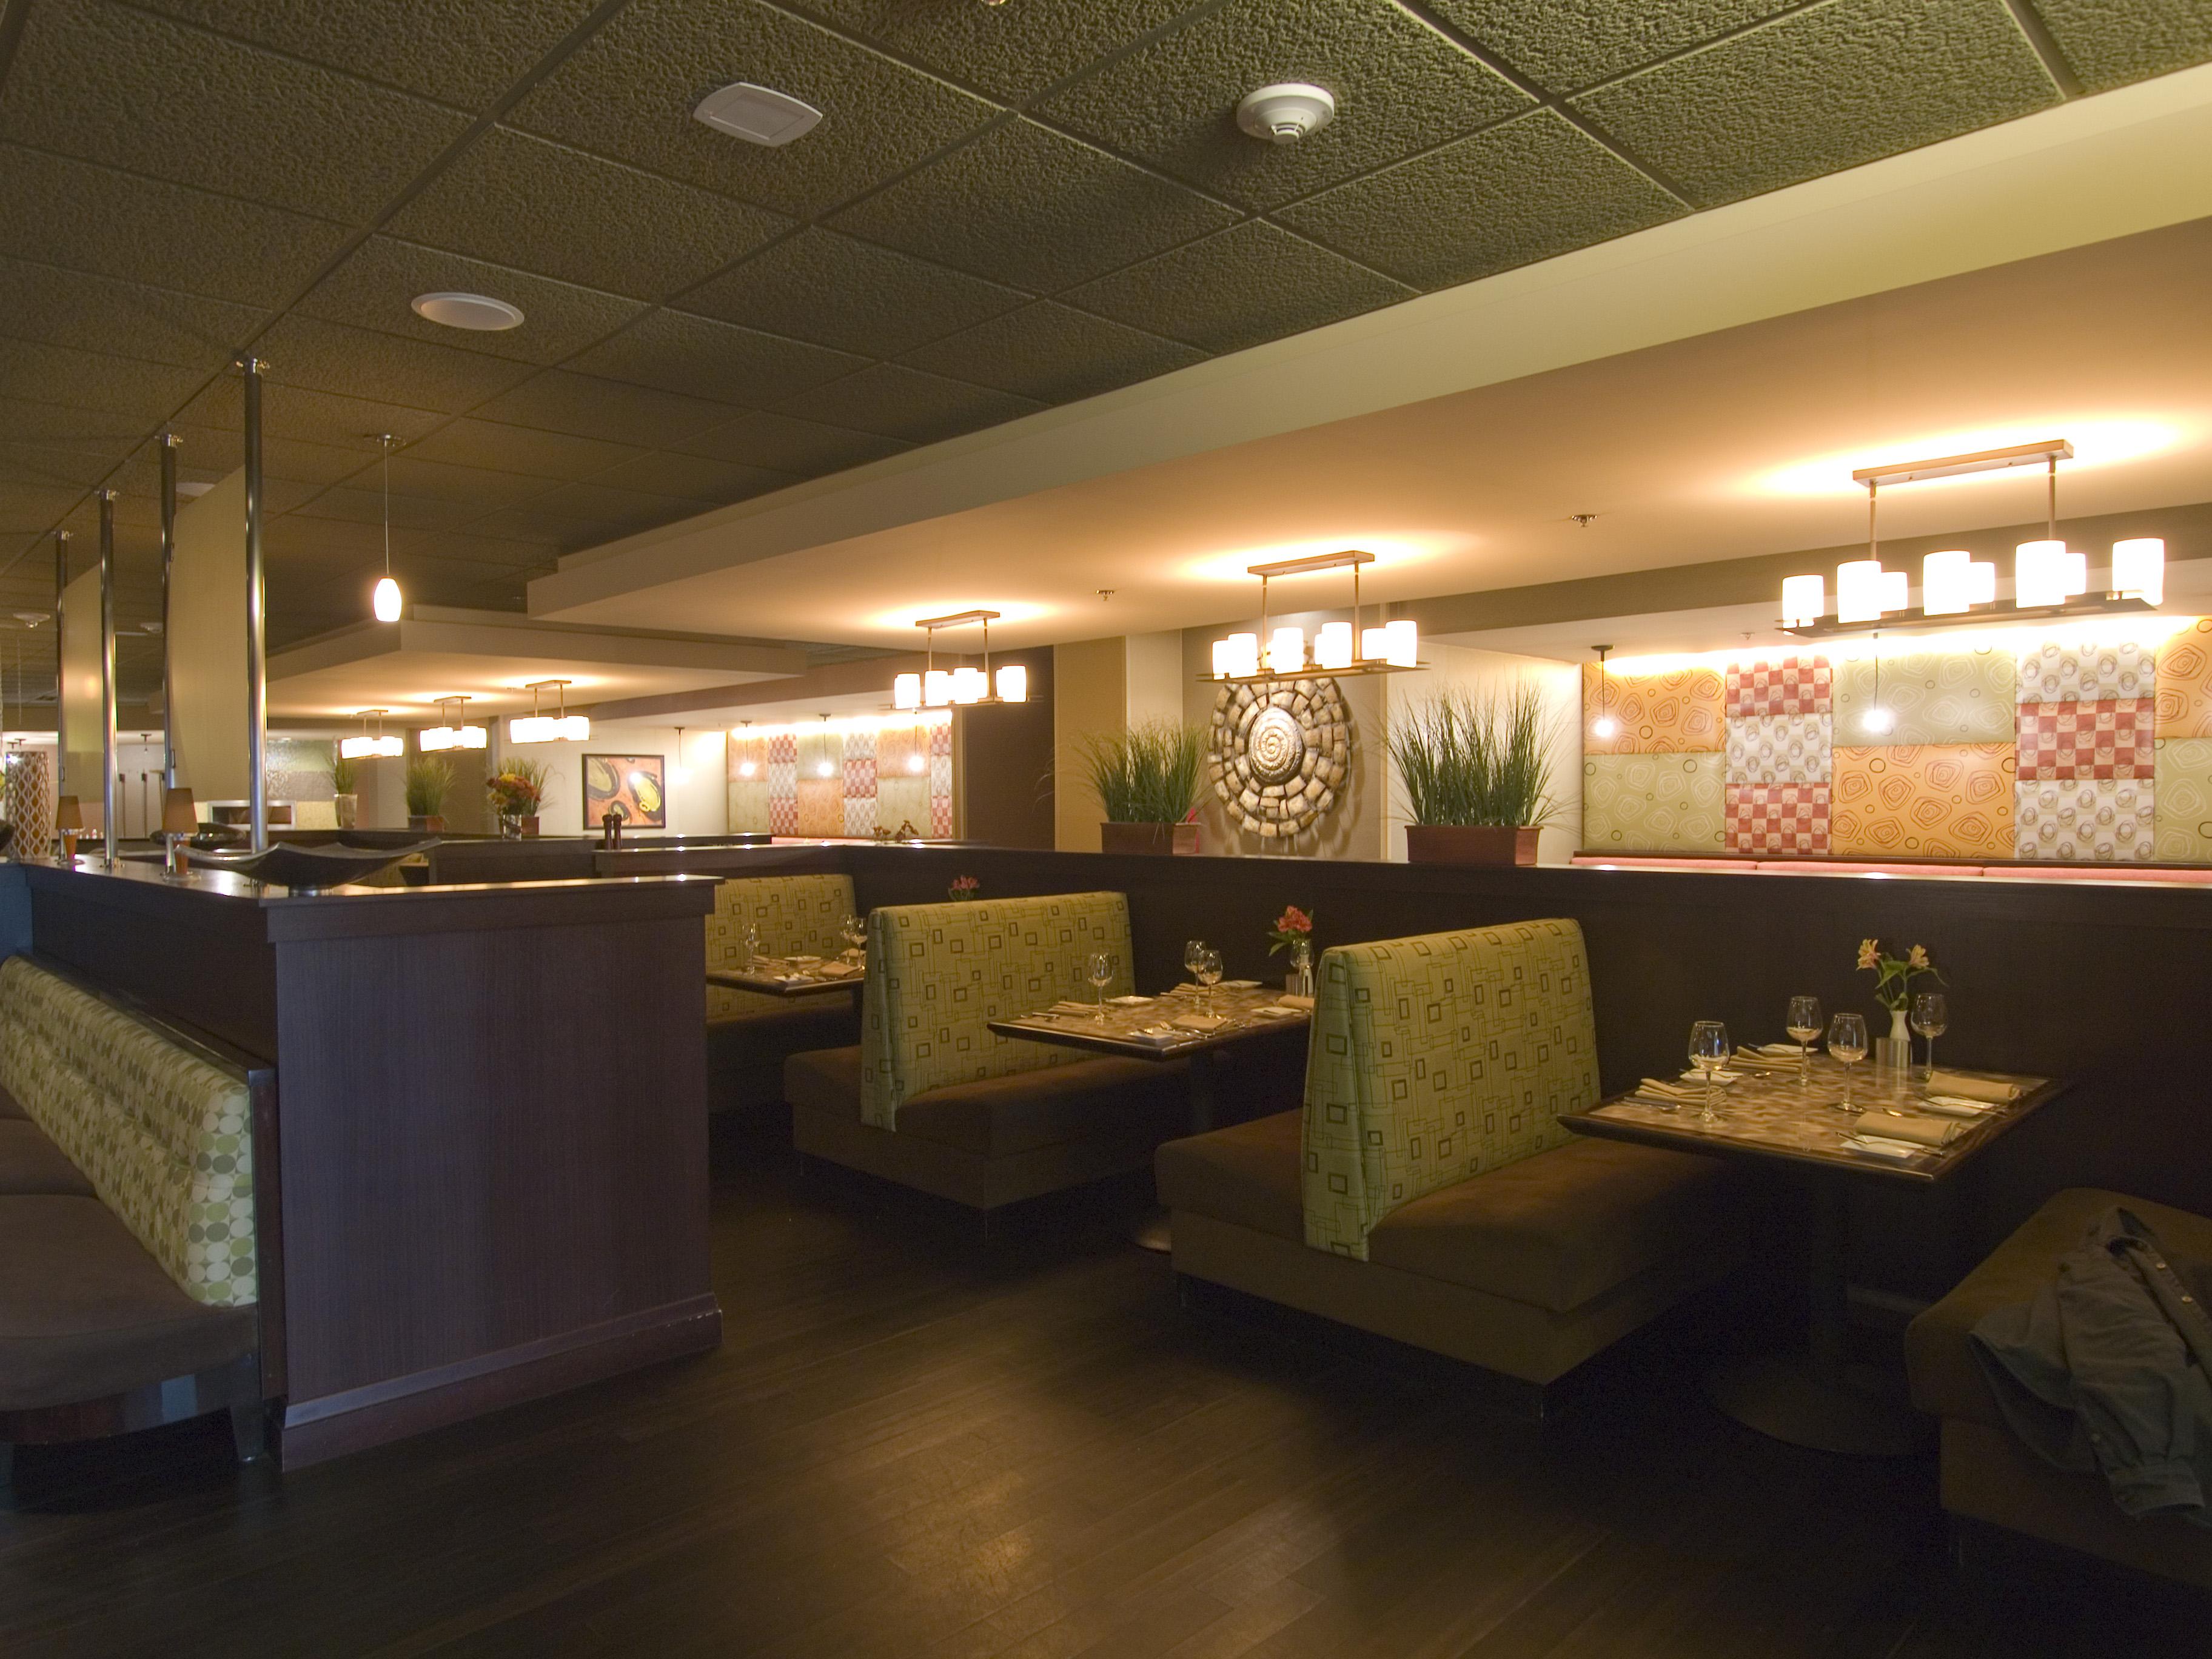 Delicieux Zink Kitchen + Bar At Stonebridge Companiesu0027 DoubleTree By Hilton Denver  Tech Center Receives Prestigious 2013 TripAdvisor Certificate Of Excellence